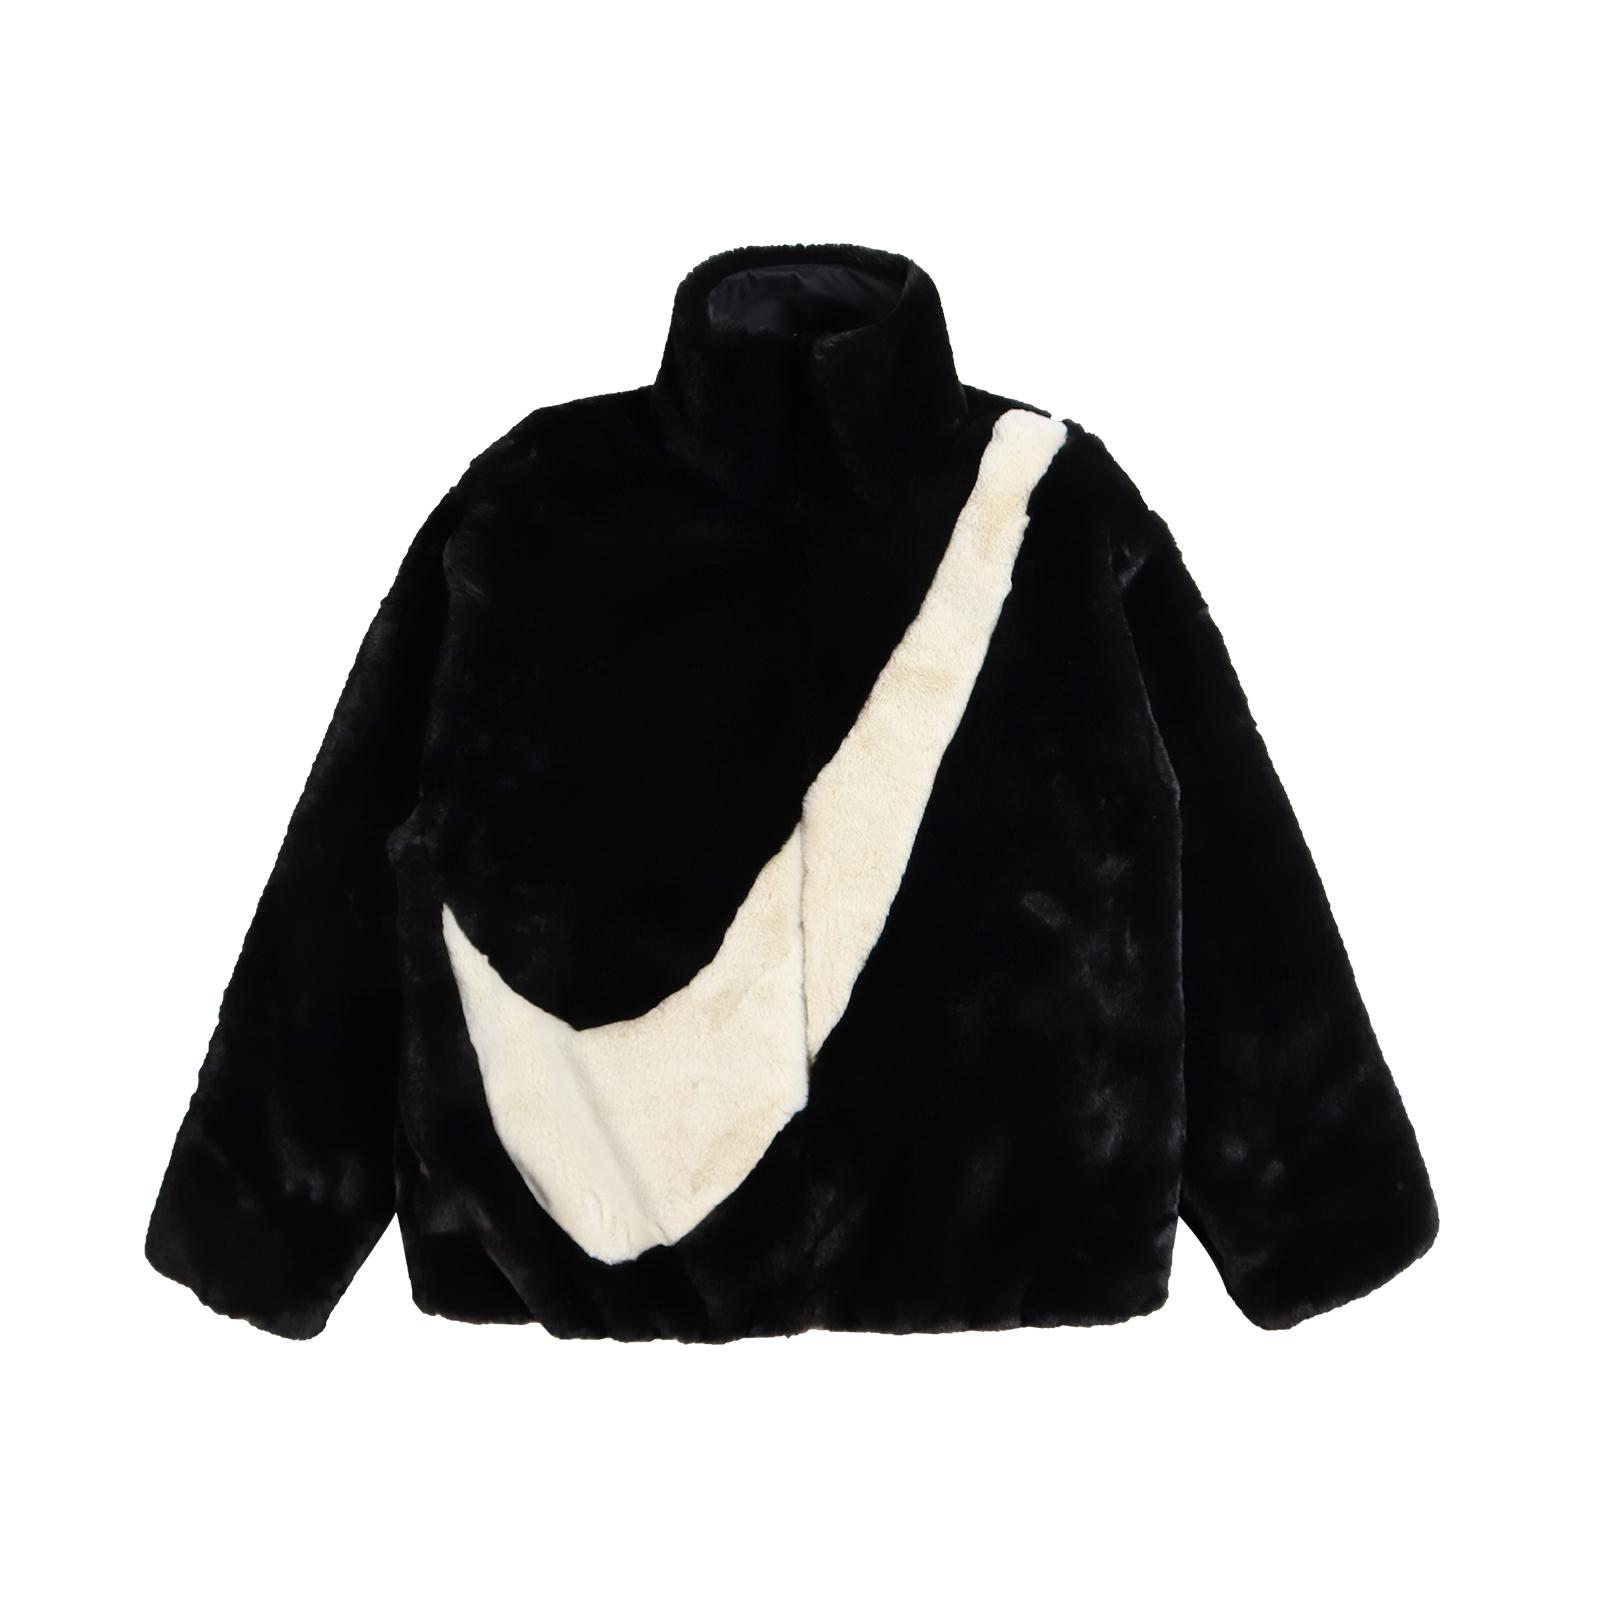 Nike 外套 NSW Faux Fur Jacket 黑 白 女款 羔羊外套 絨毛 勾勾【ACS】CU6559-010